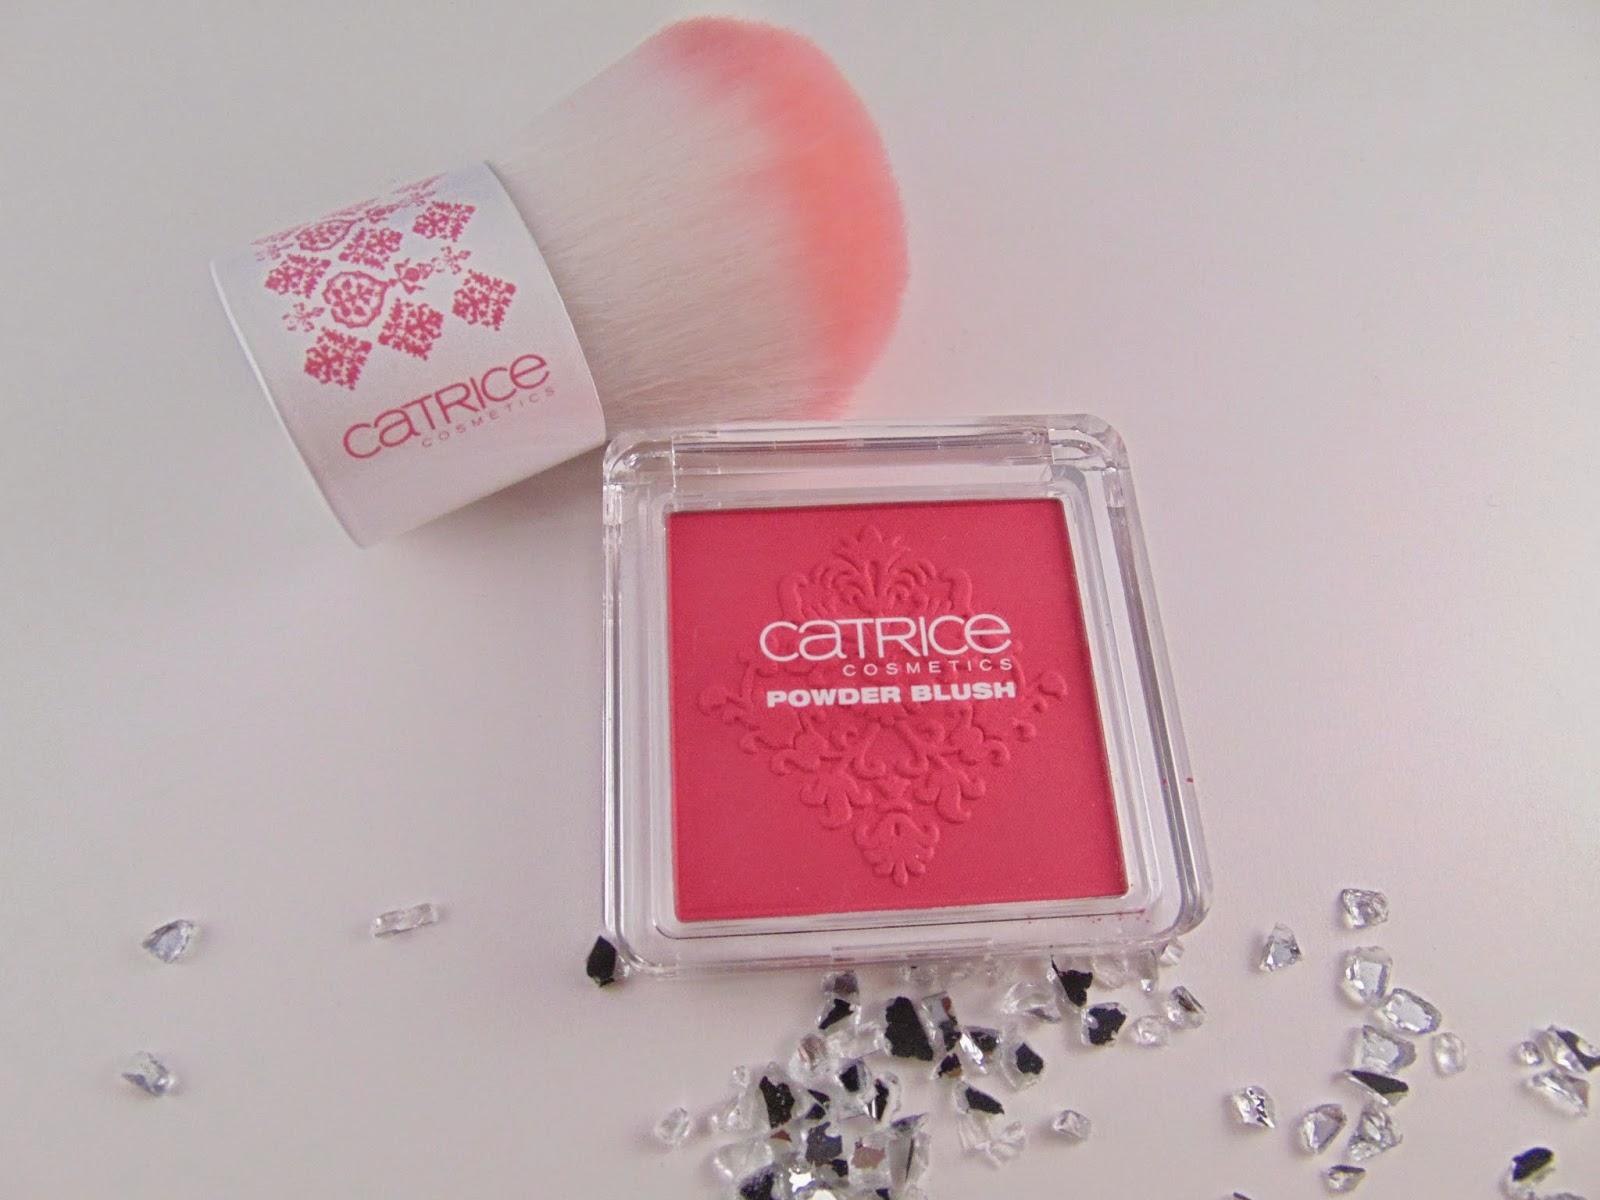 Catrice LE - Rock-O-CO - Brush & Blush- www.annitschkasblog.de